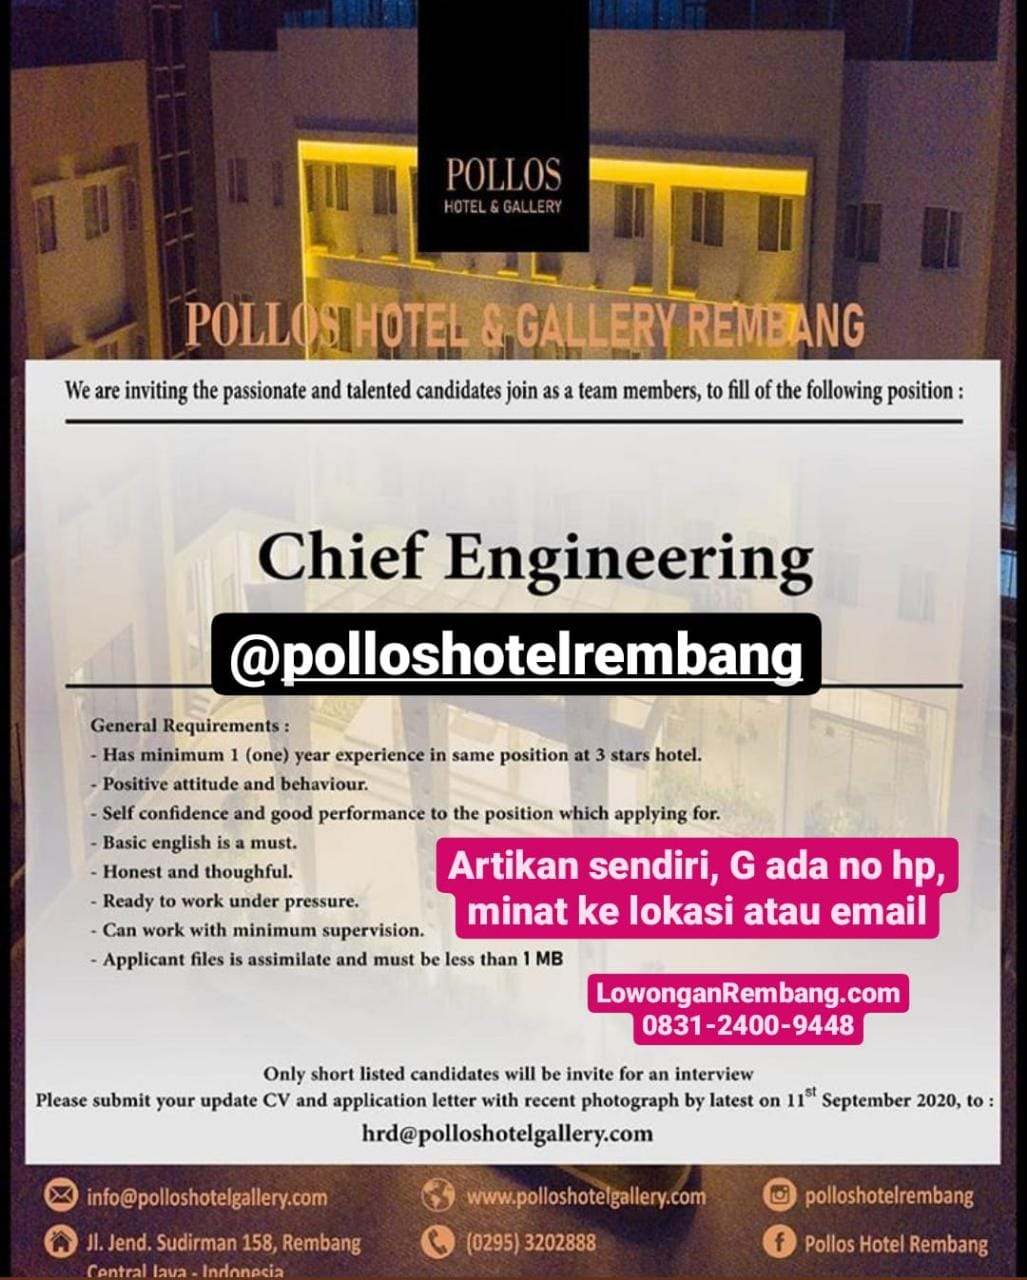 http://www.lowonganrembang.com/2020/09/lowongan-kerja-hotel-pollos-rembang.html